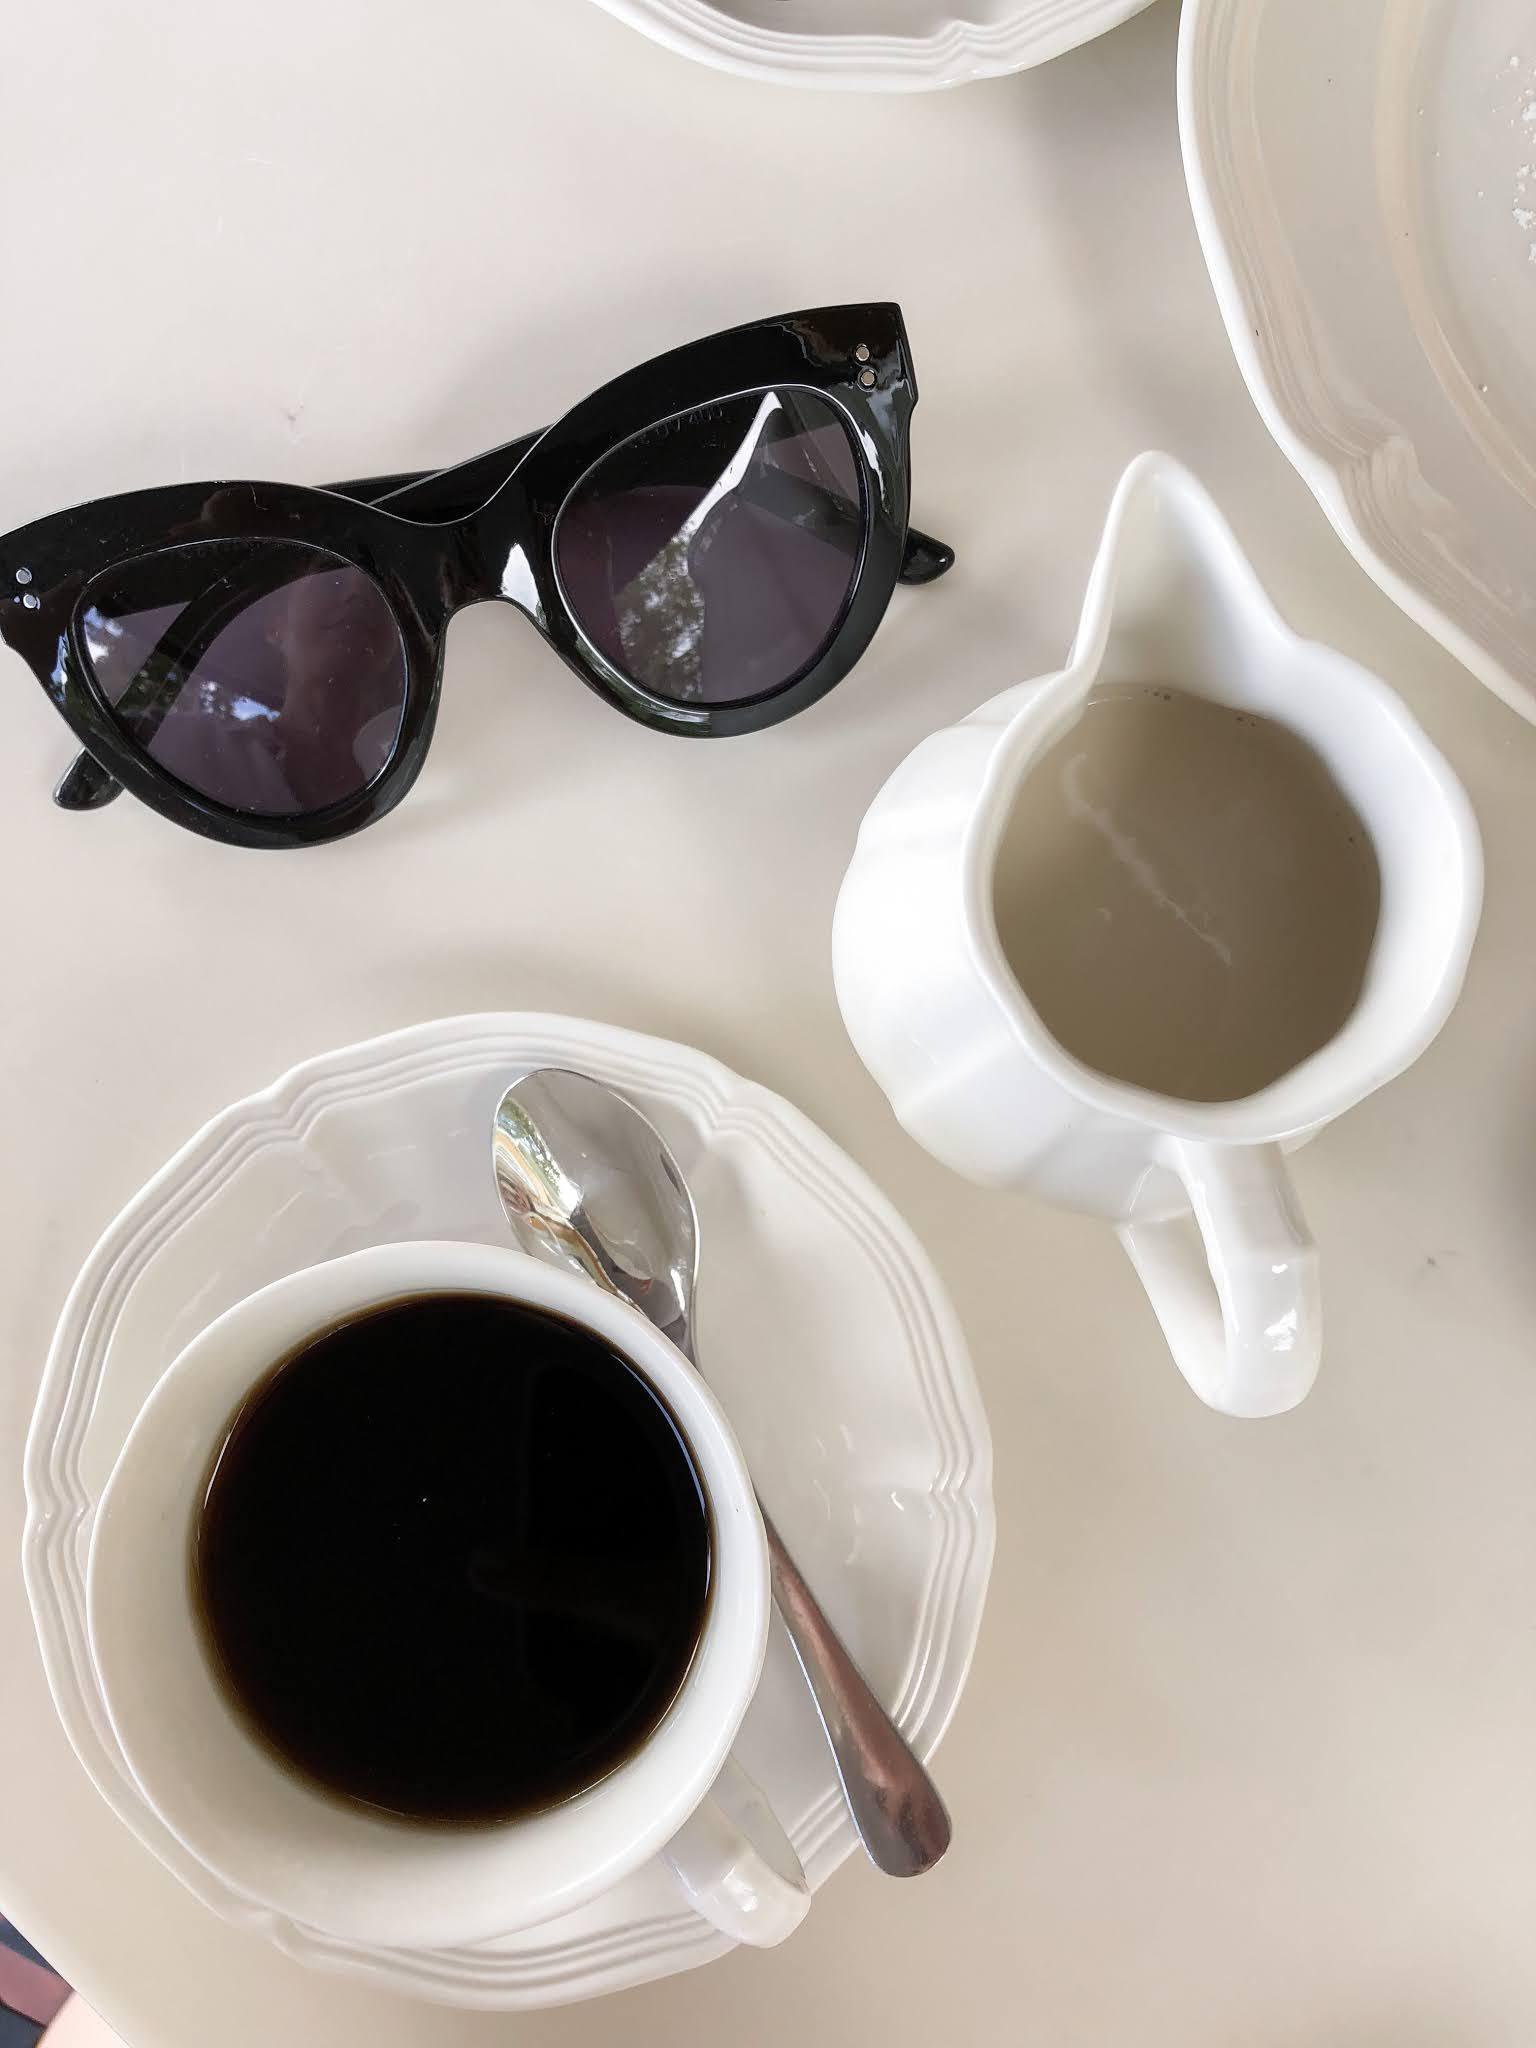 Tiittalan kartano vohvelikahvila // Tiittala manor waffle cafe